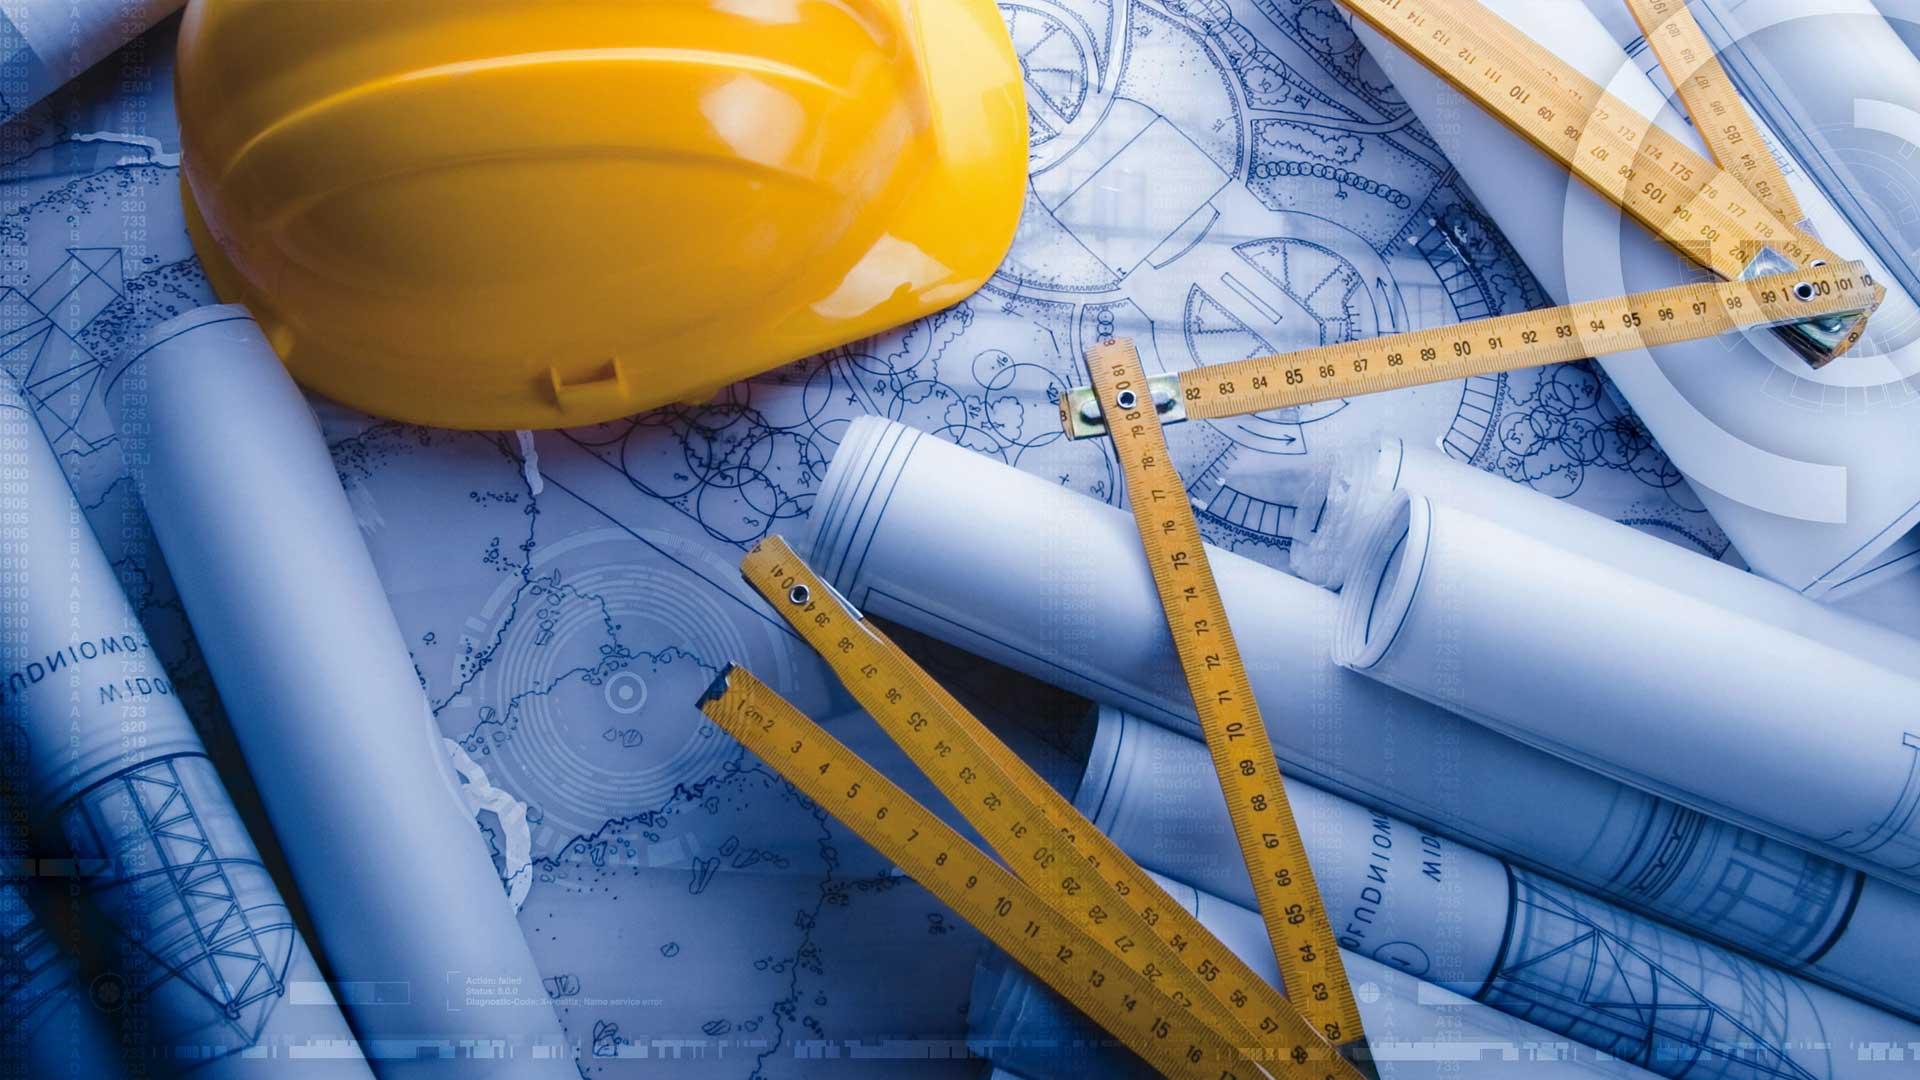 Santoni Costruzioni - Impresa Edile Nuoro Sardegna